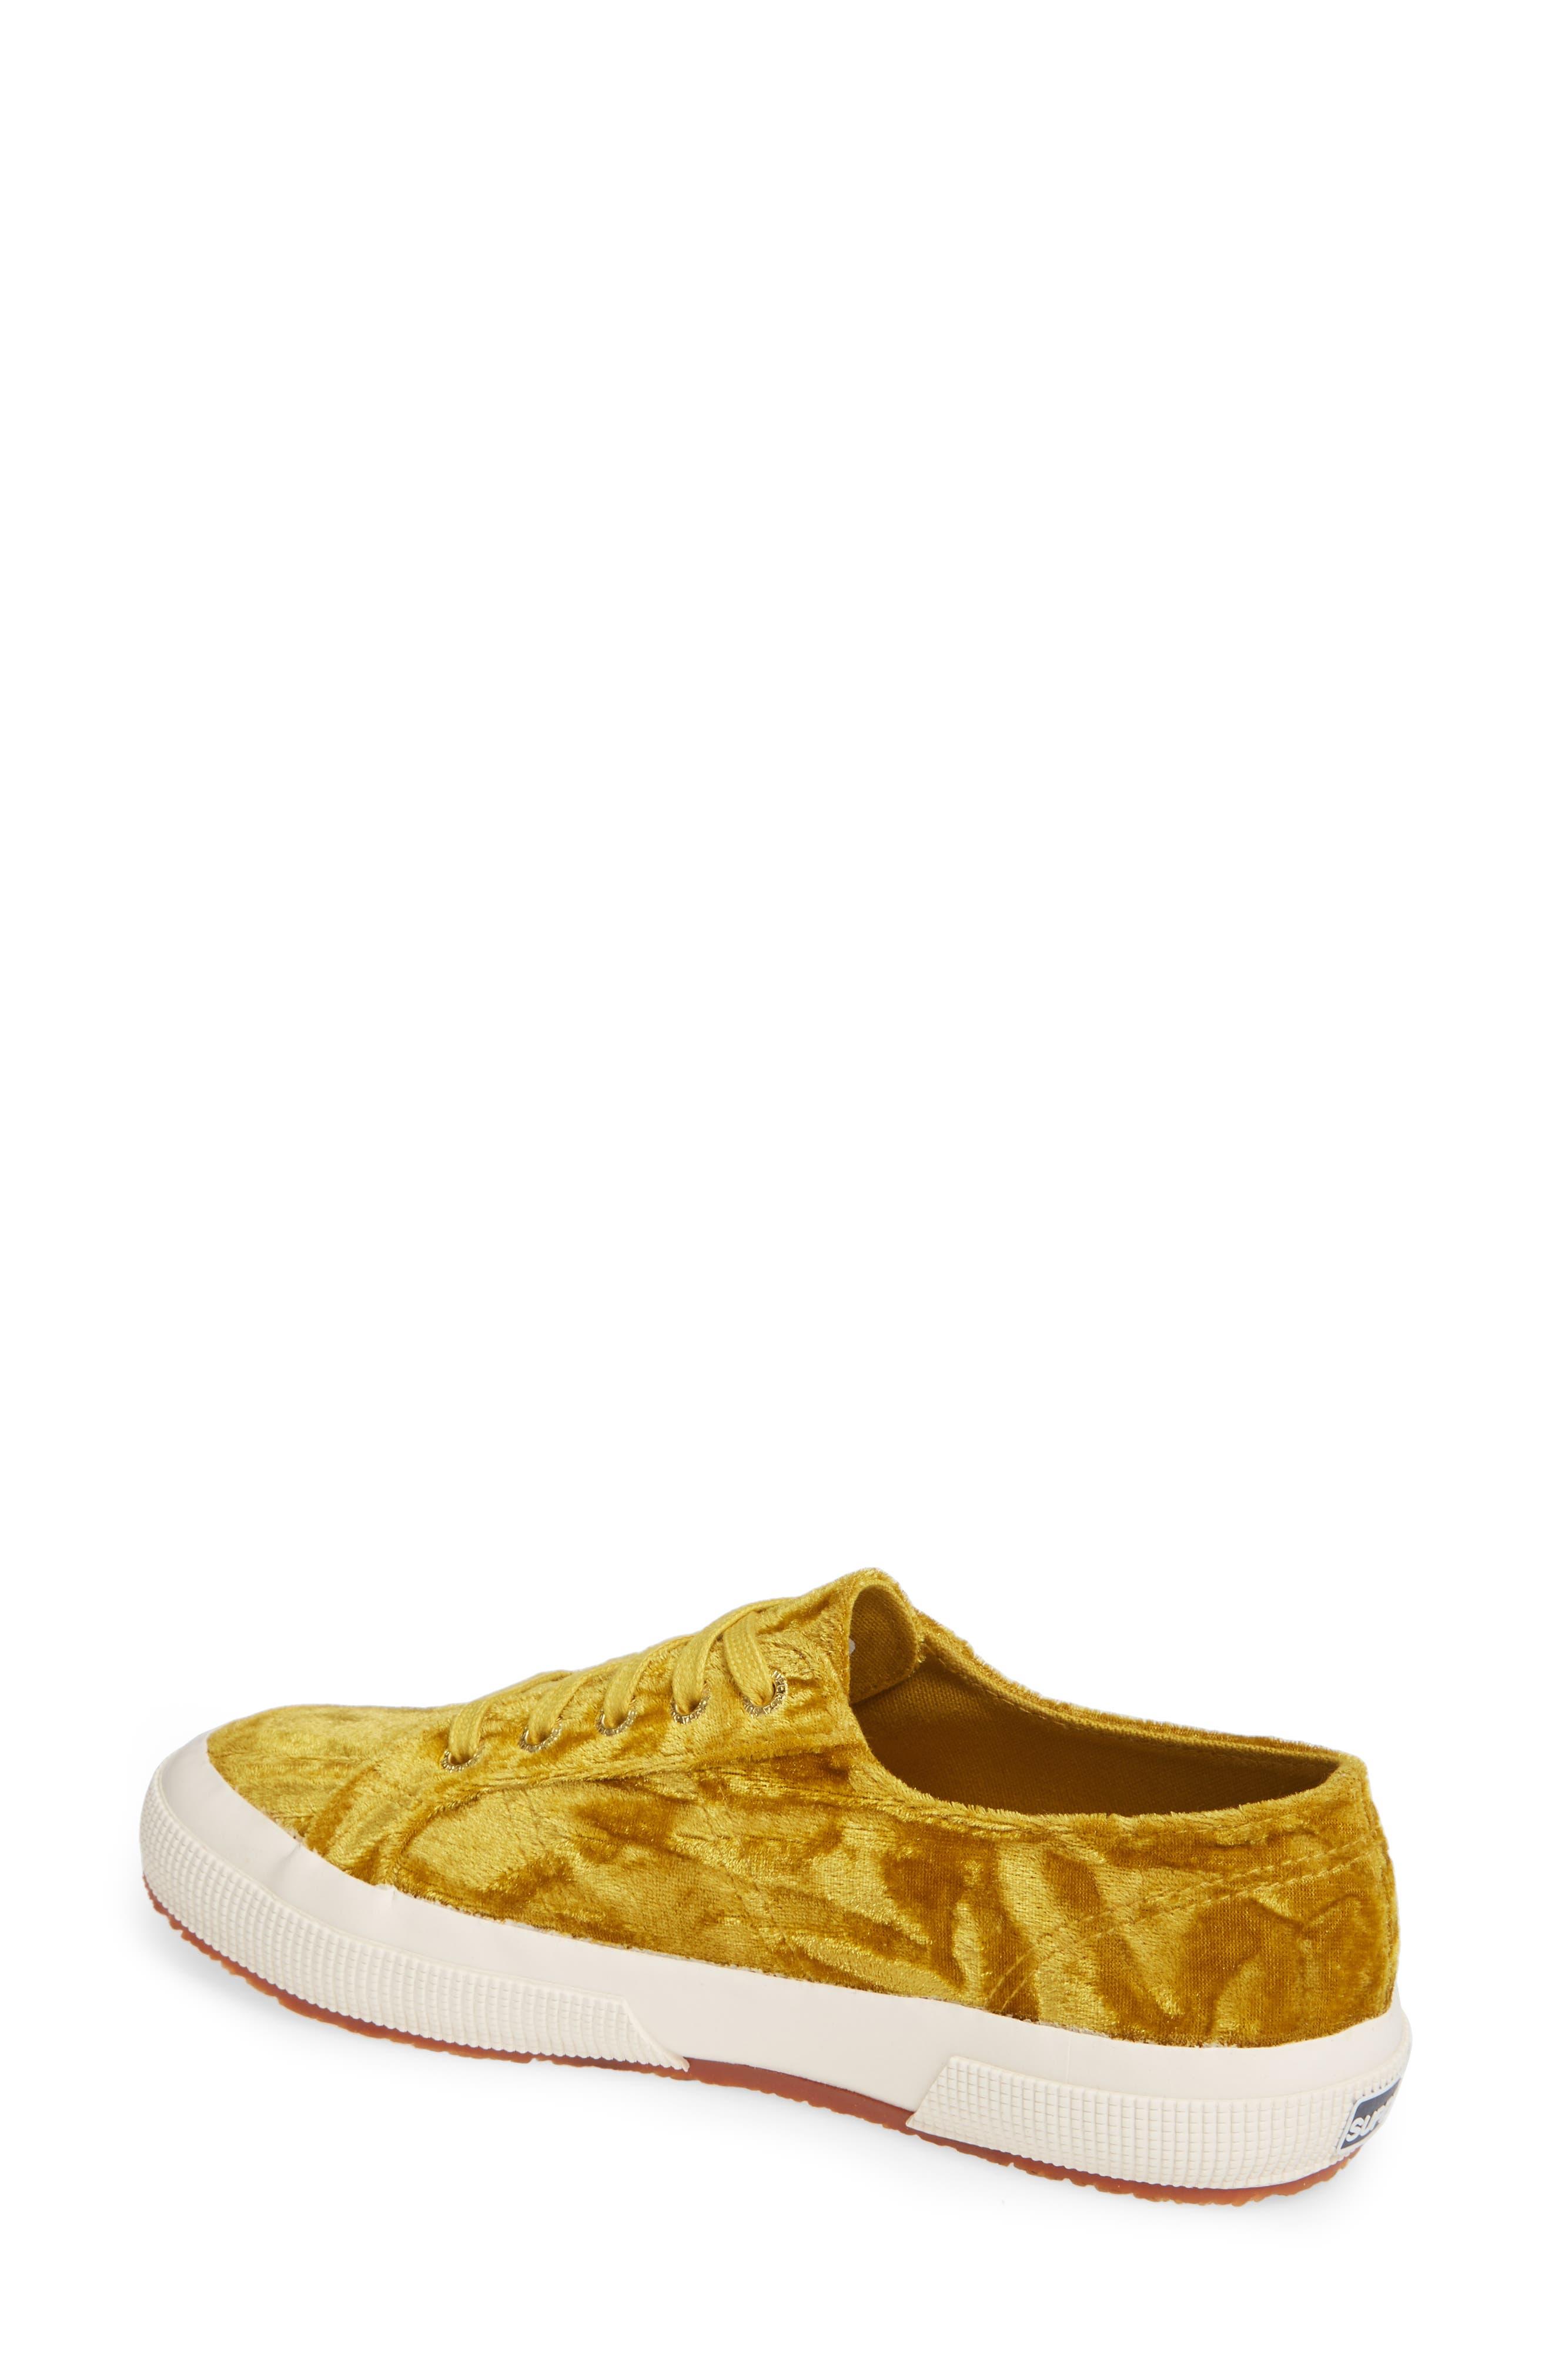 SUPERGA,                             2750 Sneaker,                             Alternate thumbnail 2, color,                             700